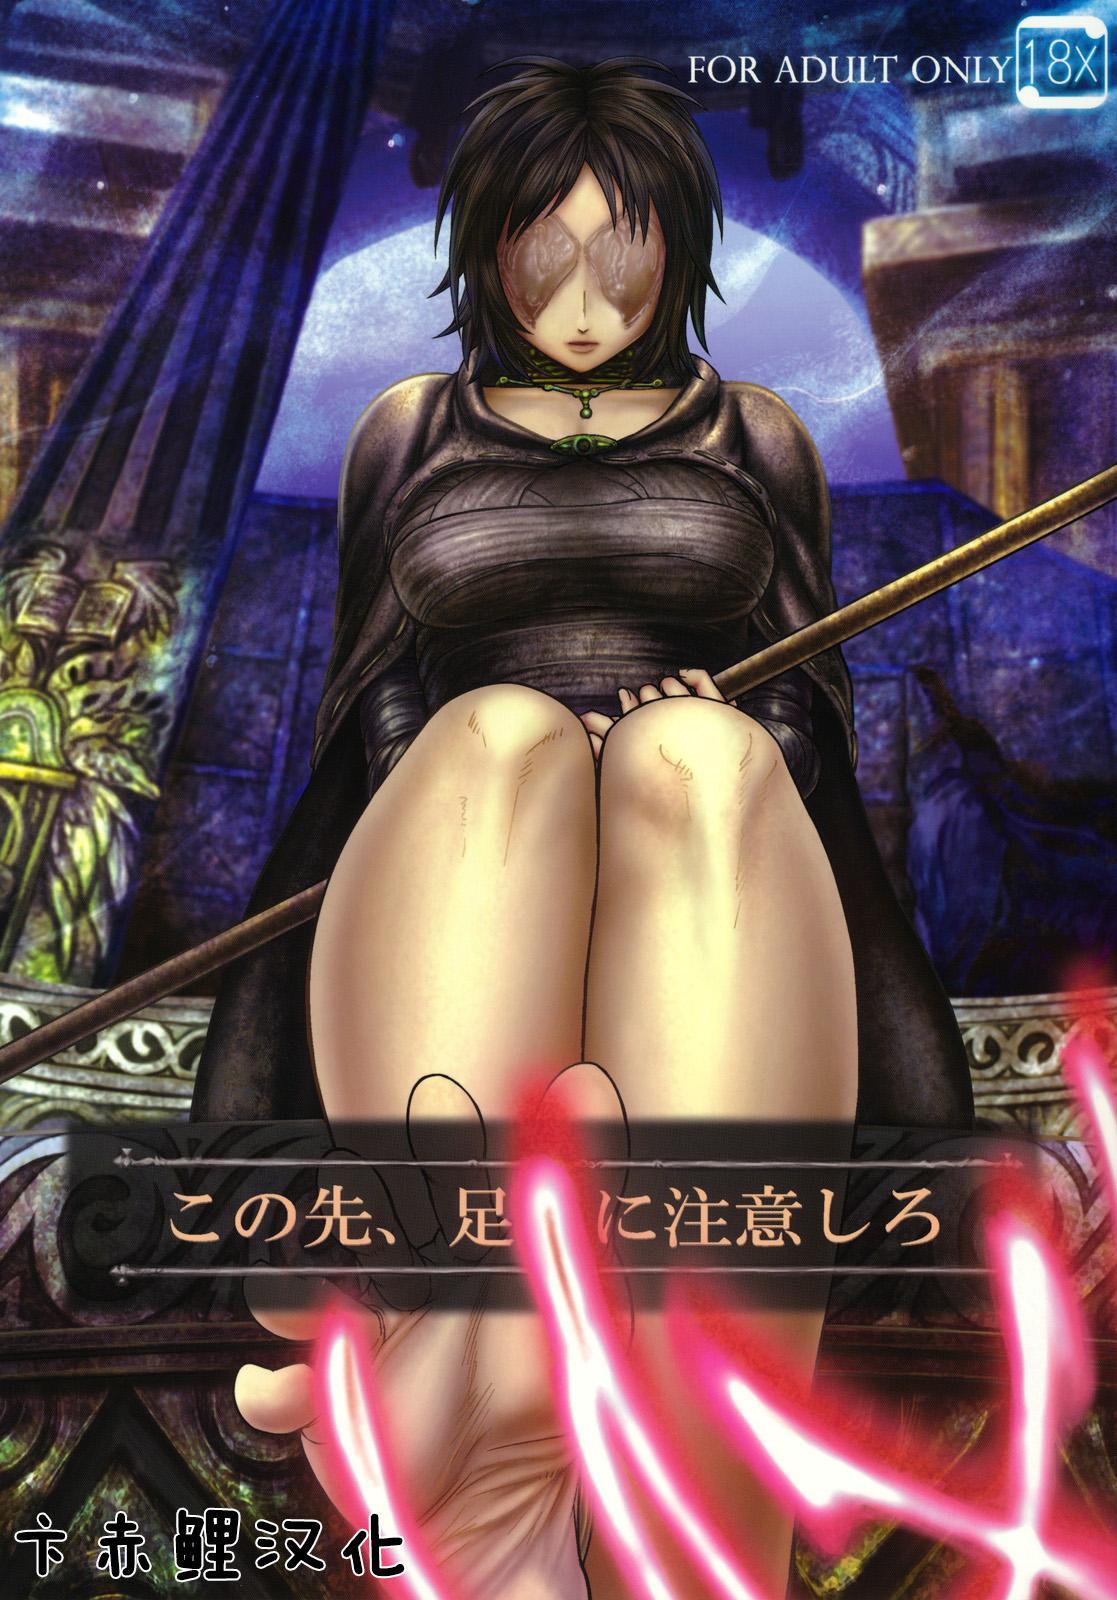 Kono Saki, Ashi ni Chuuishiro | Be Wary of Feet Ahead 0